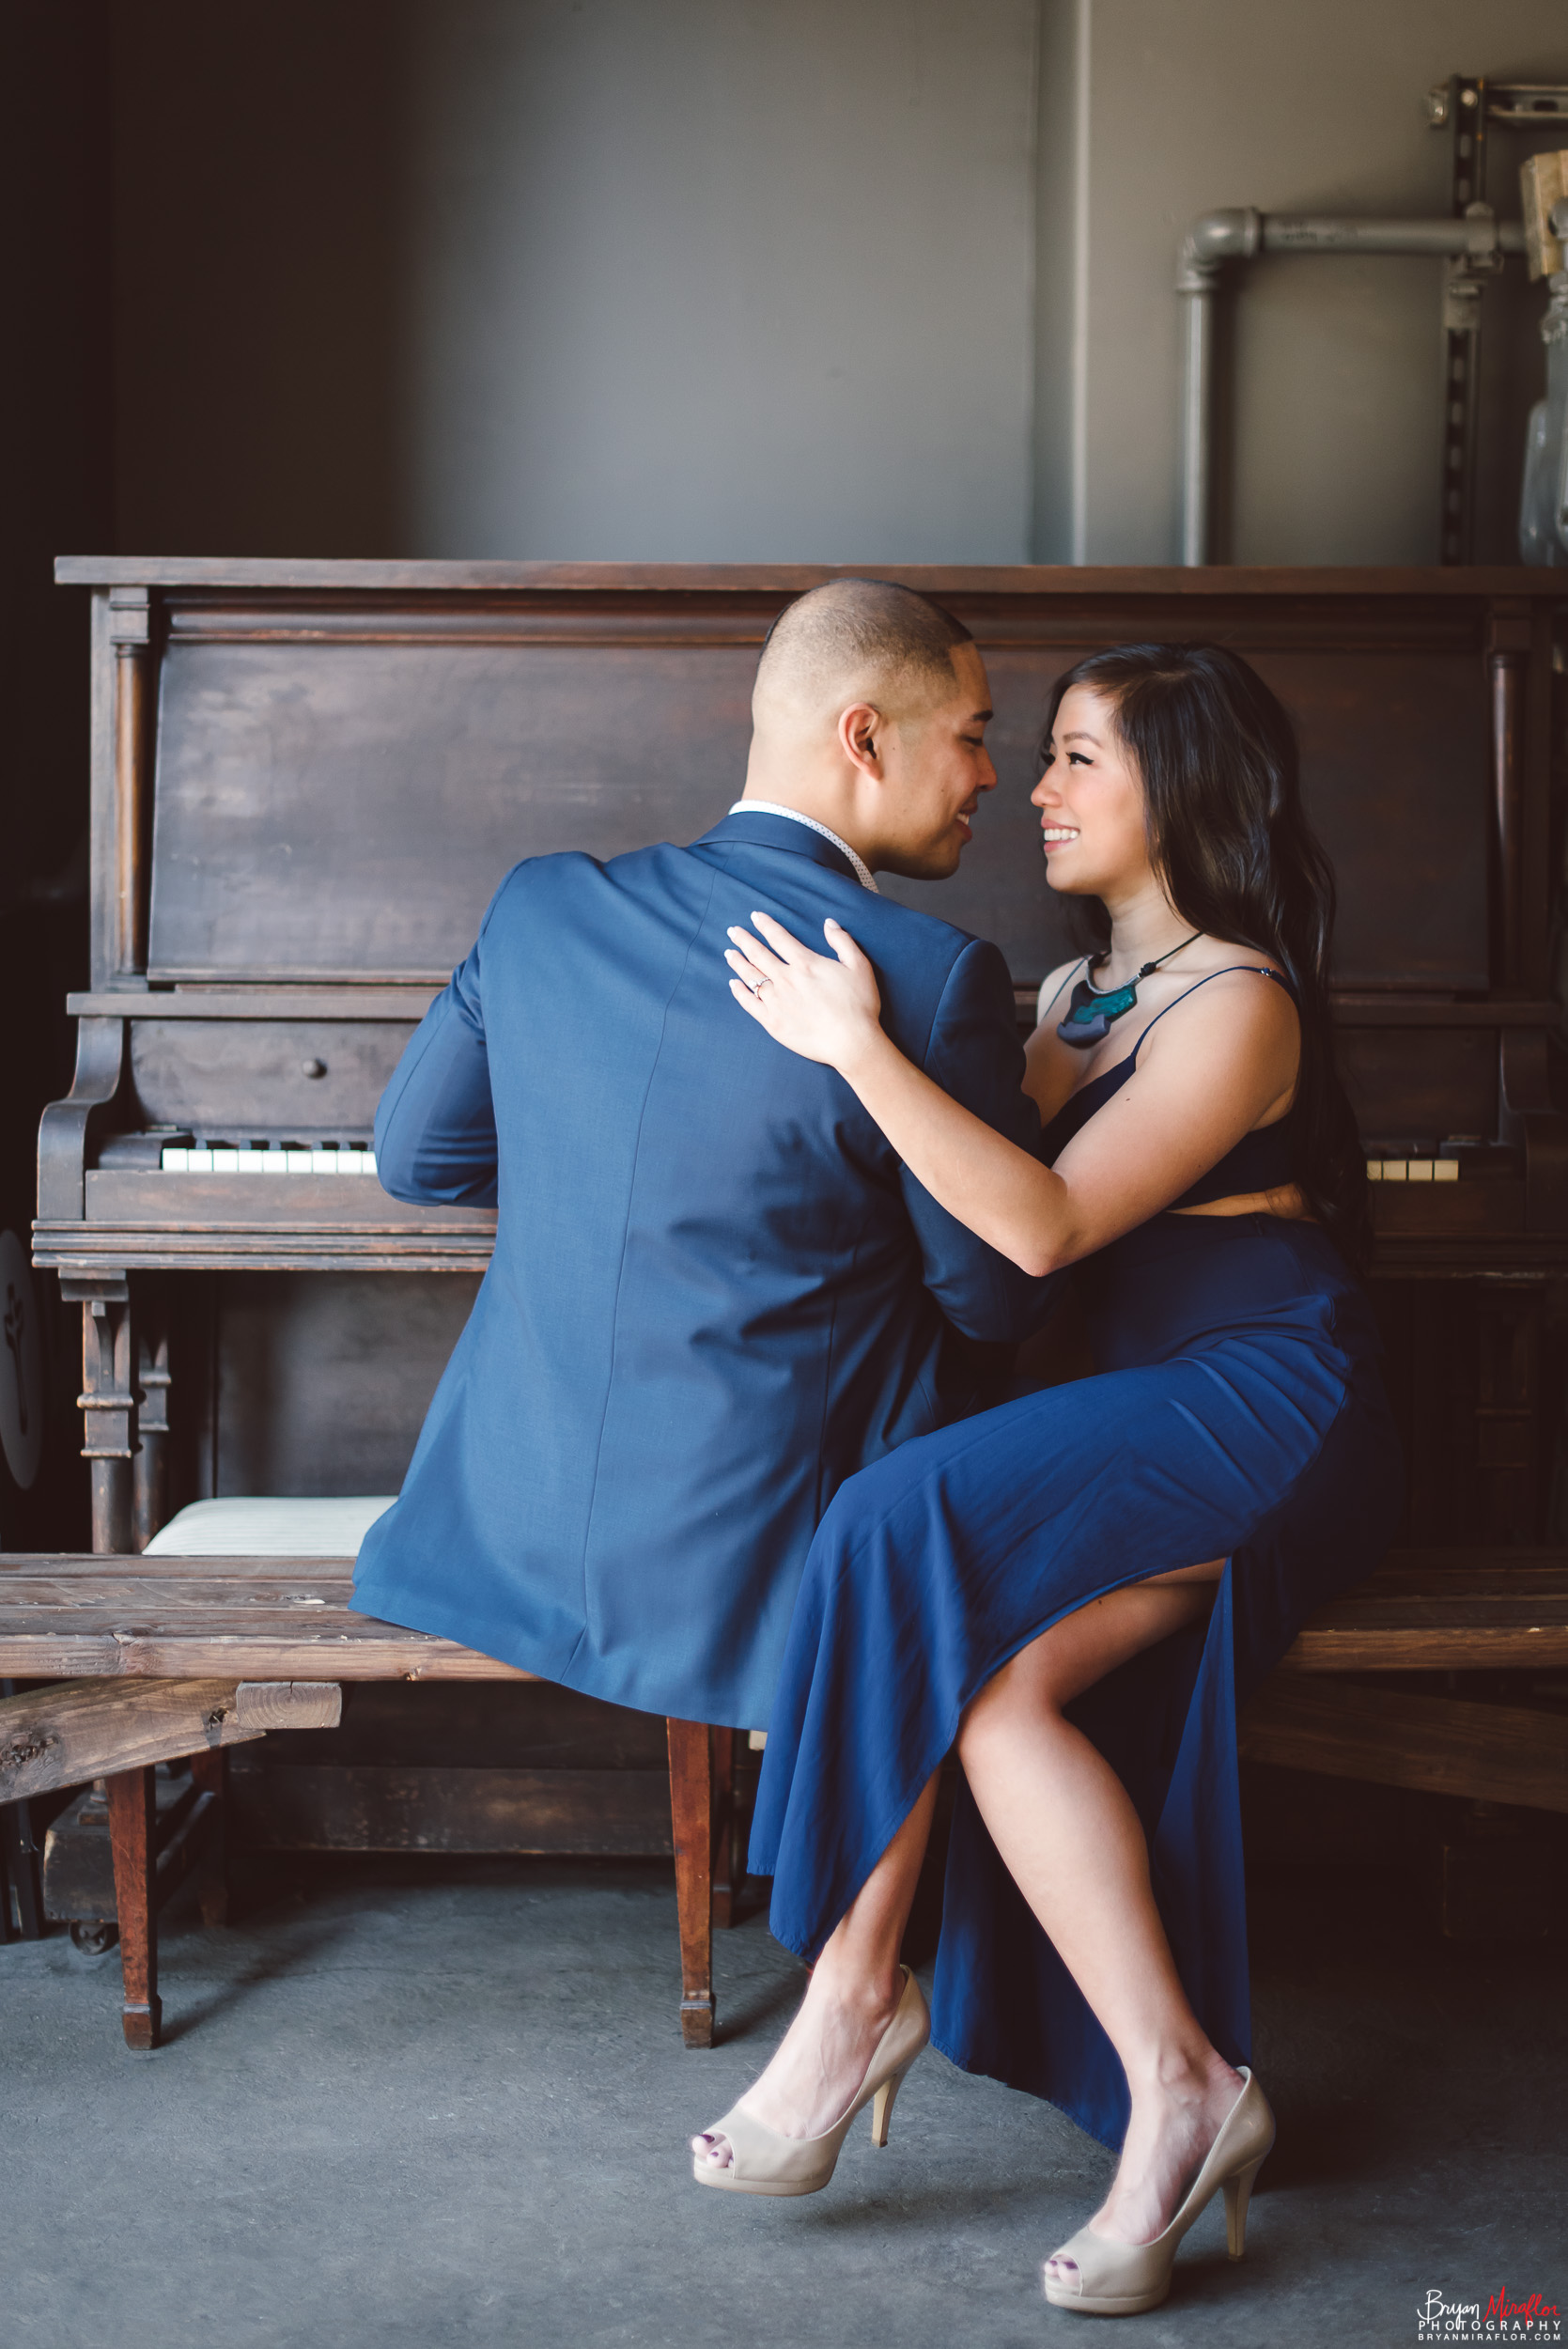 Bryan-Miraflor-Photography-Trisha-Dexter-Lopez-Engagement-Formal-DTLA-Arts-20170129-0162-Edit.jpg